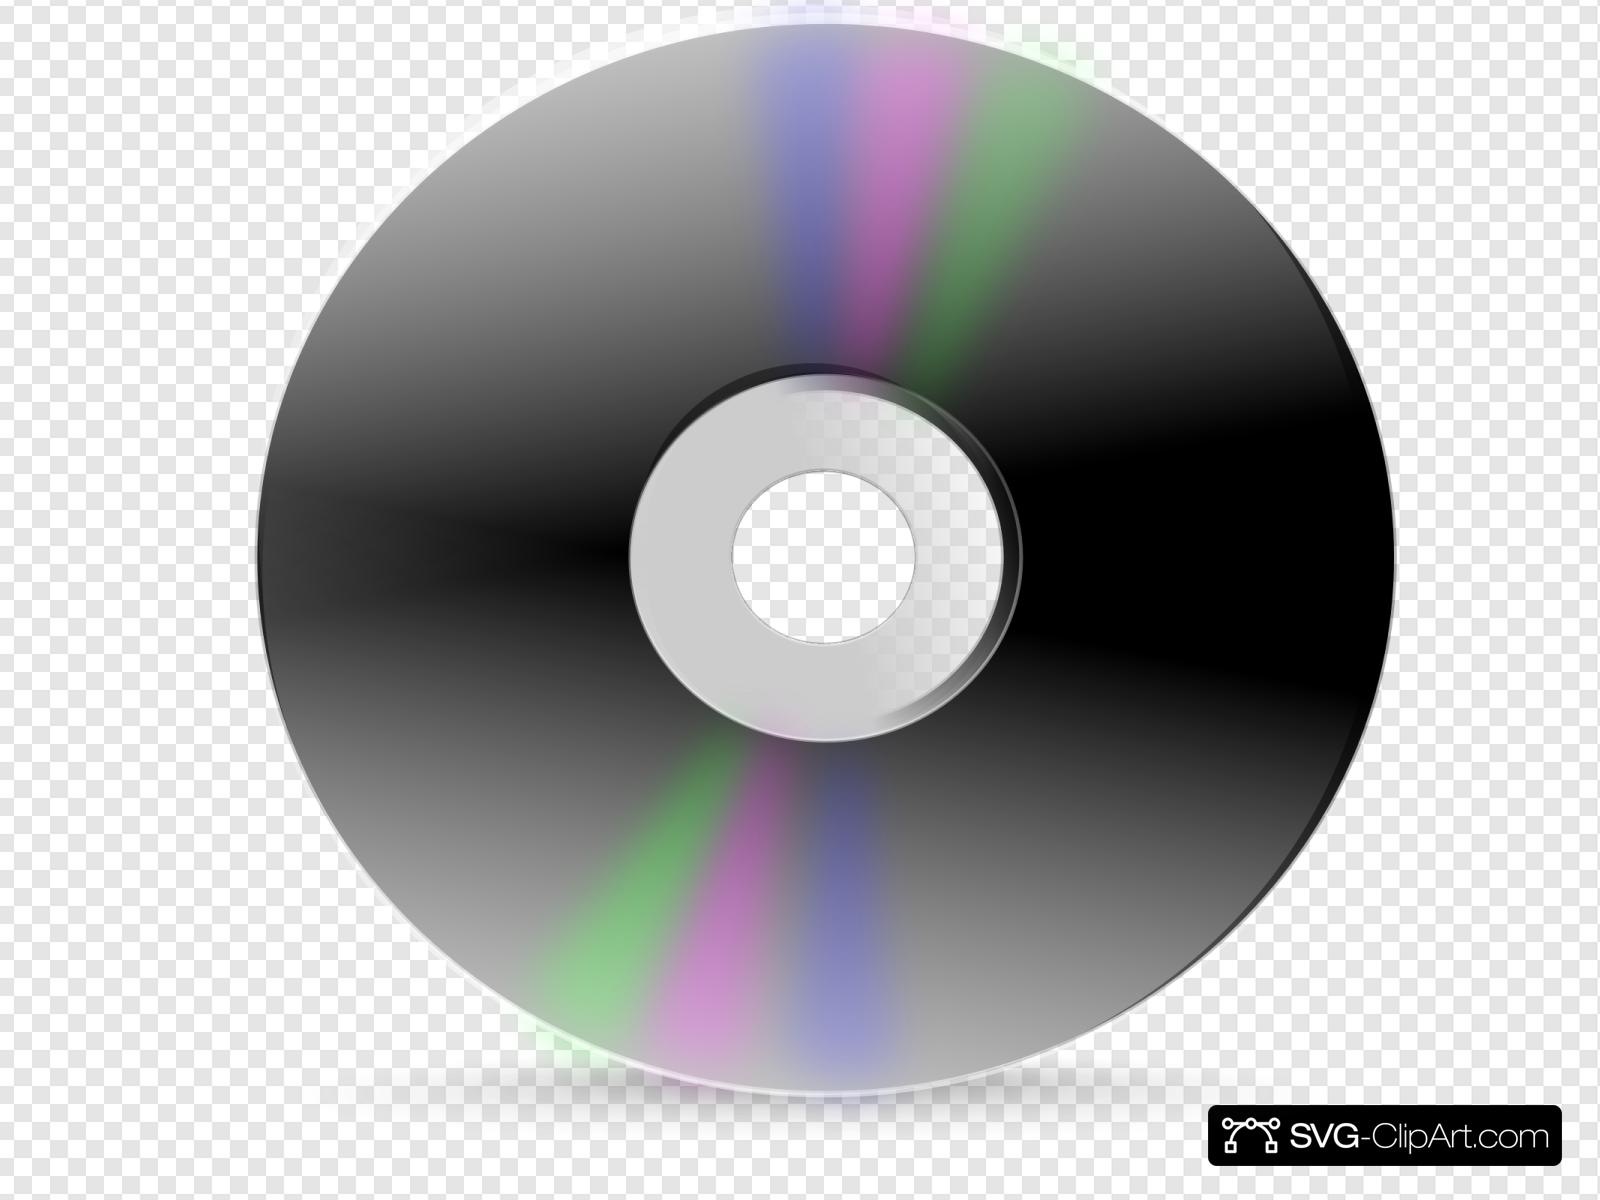 Blank clip art icon. Cd clipart svg